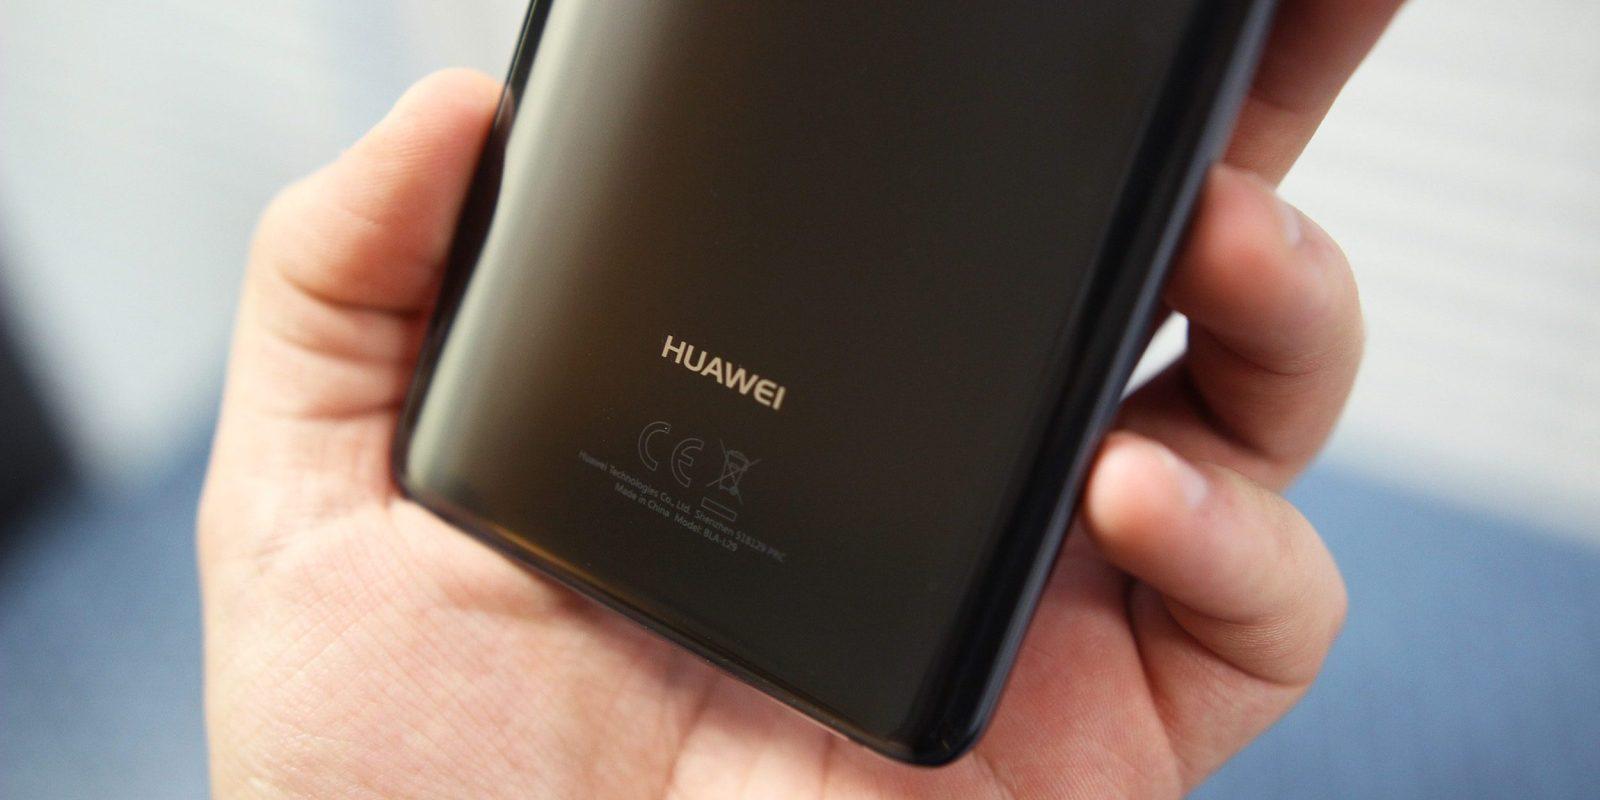 Huawei Mate 20 eta Mate 20 Pro Android Pie-rekin etorriko dira